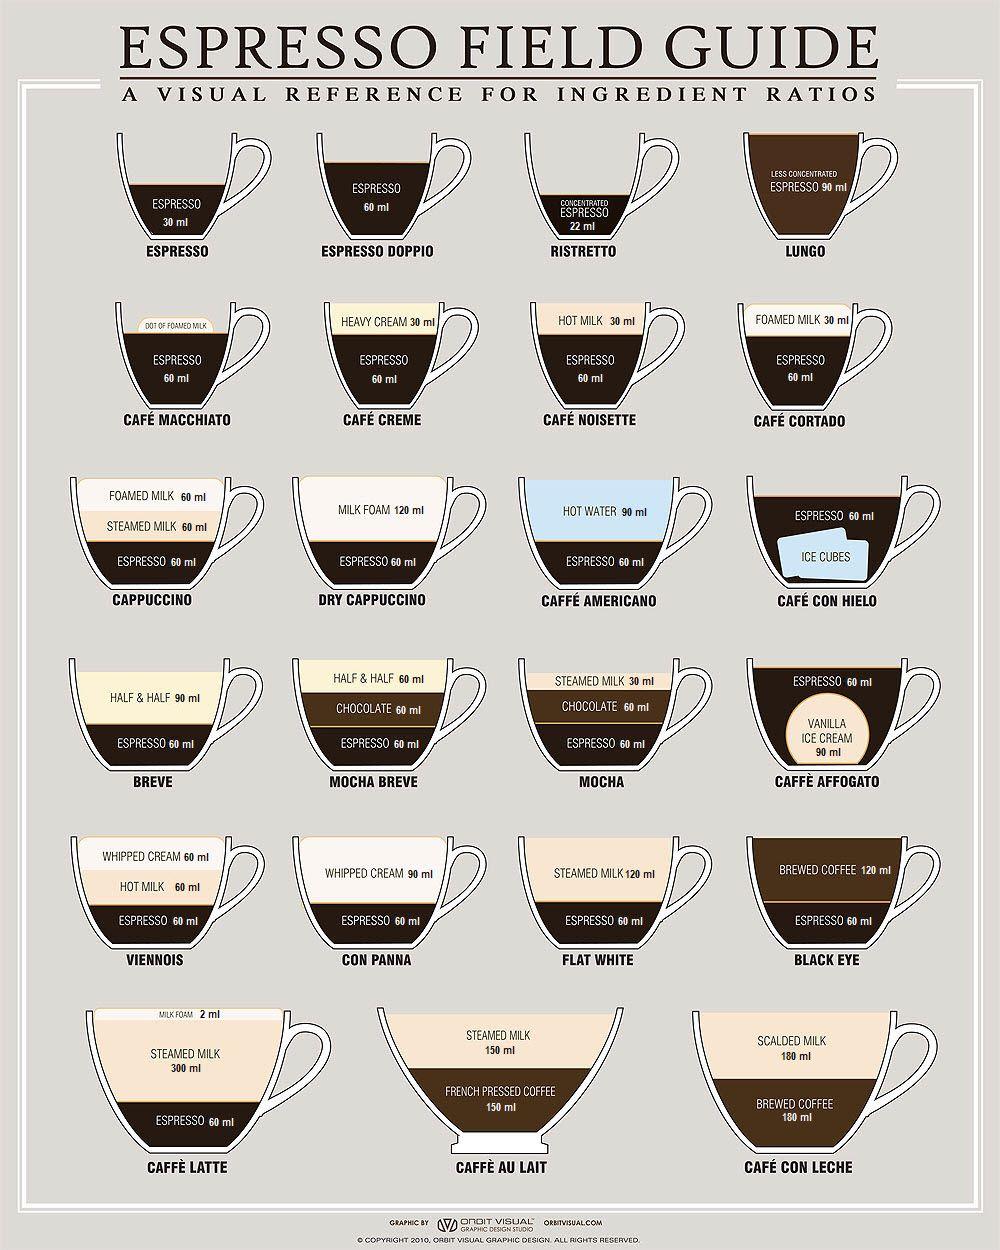 Espresso Field Guide (via Design You Trust)